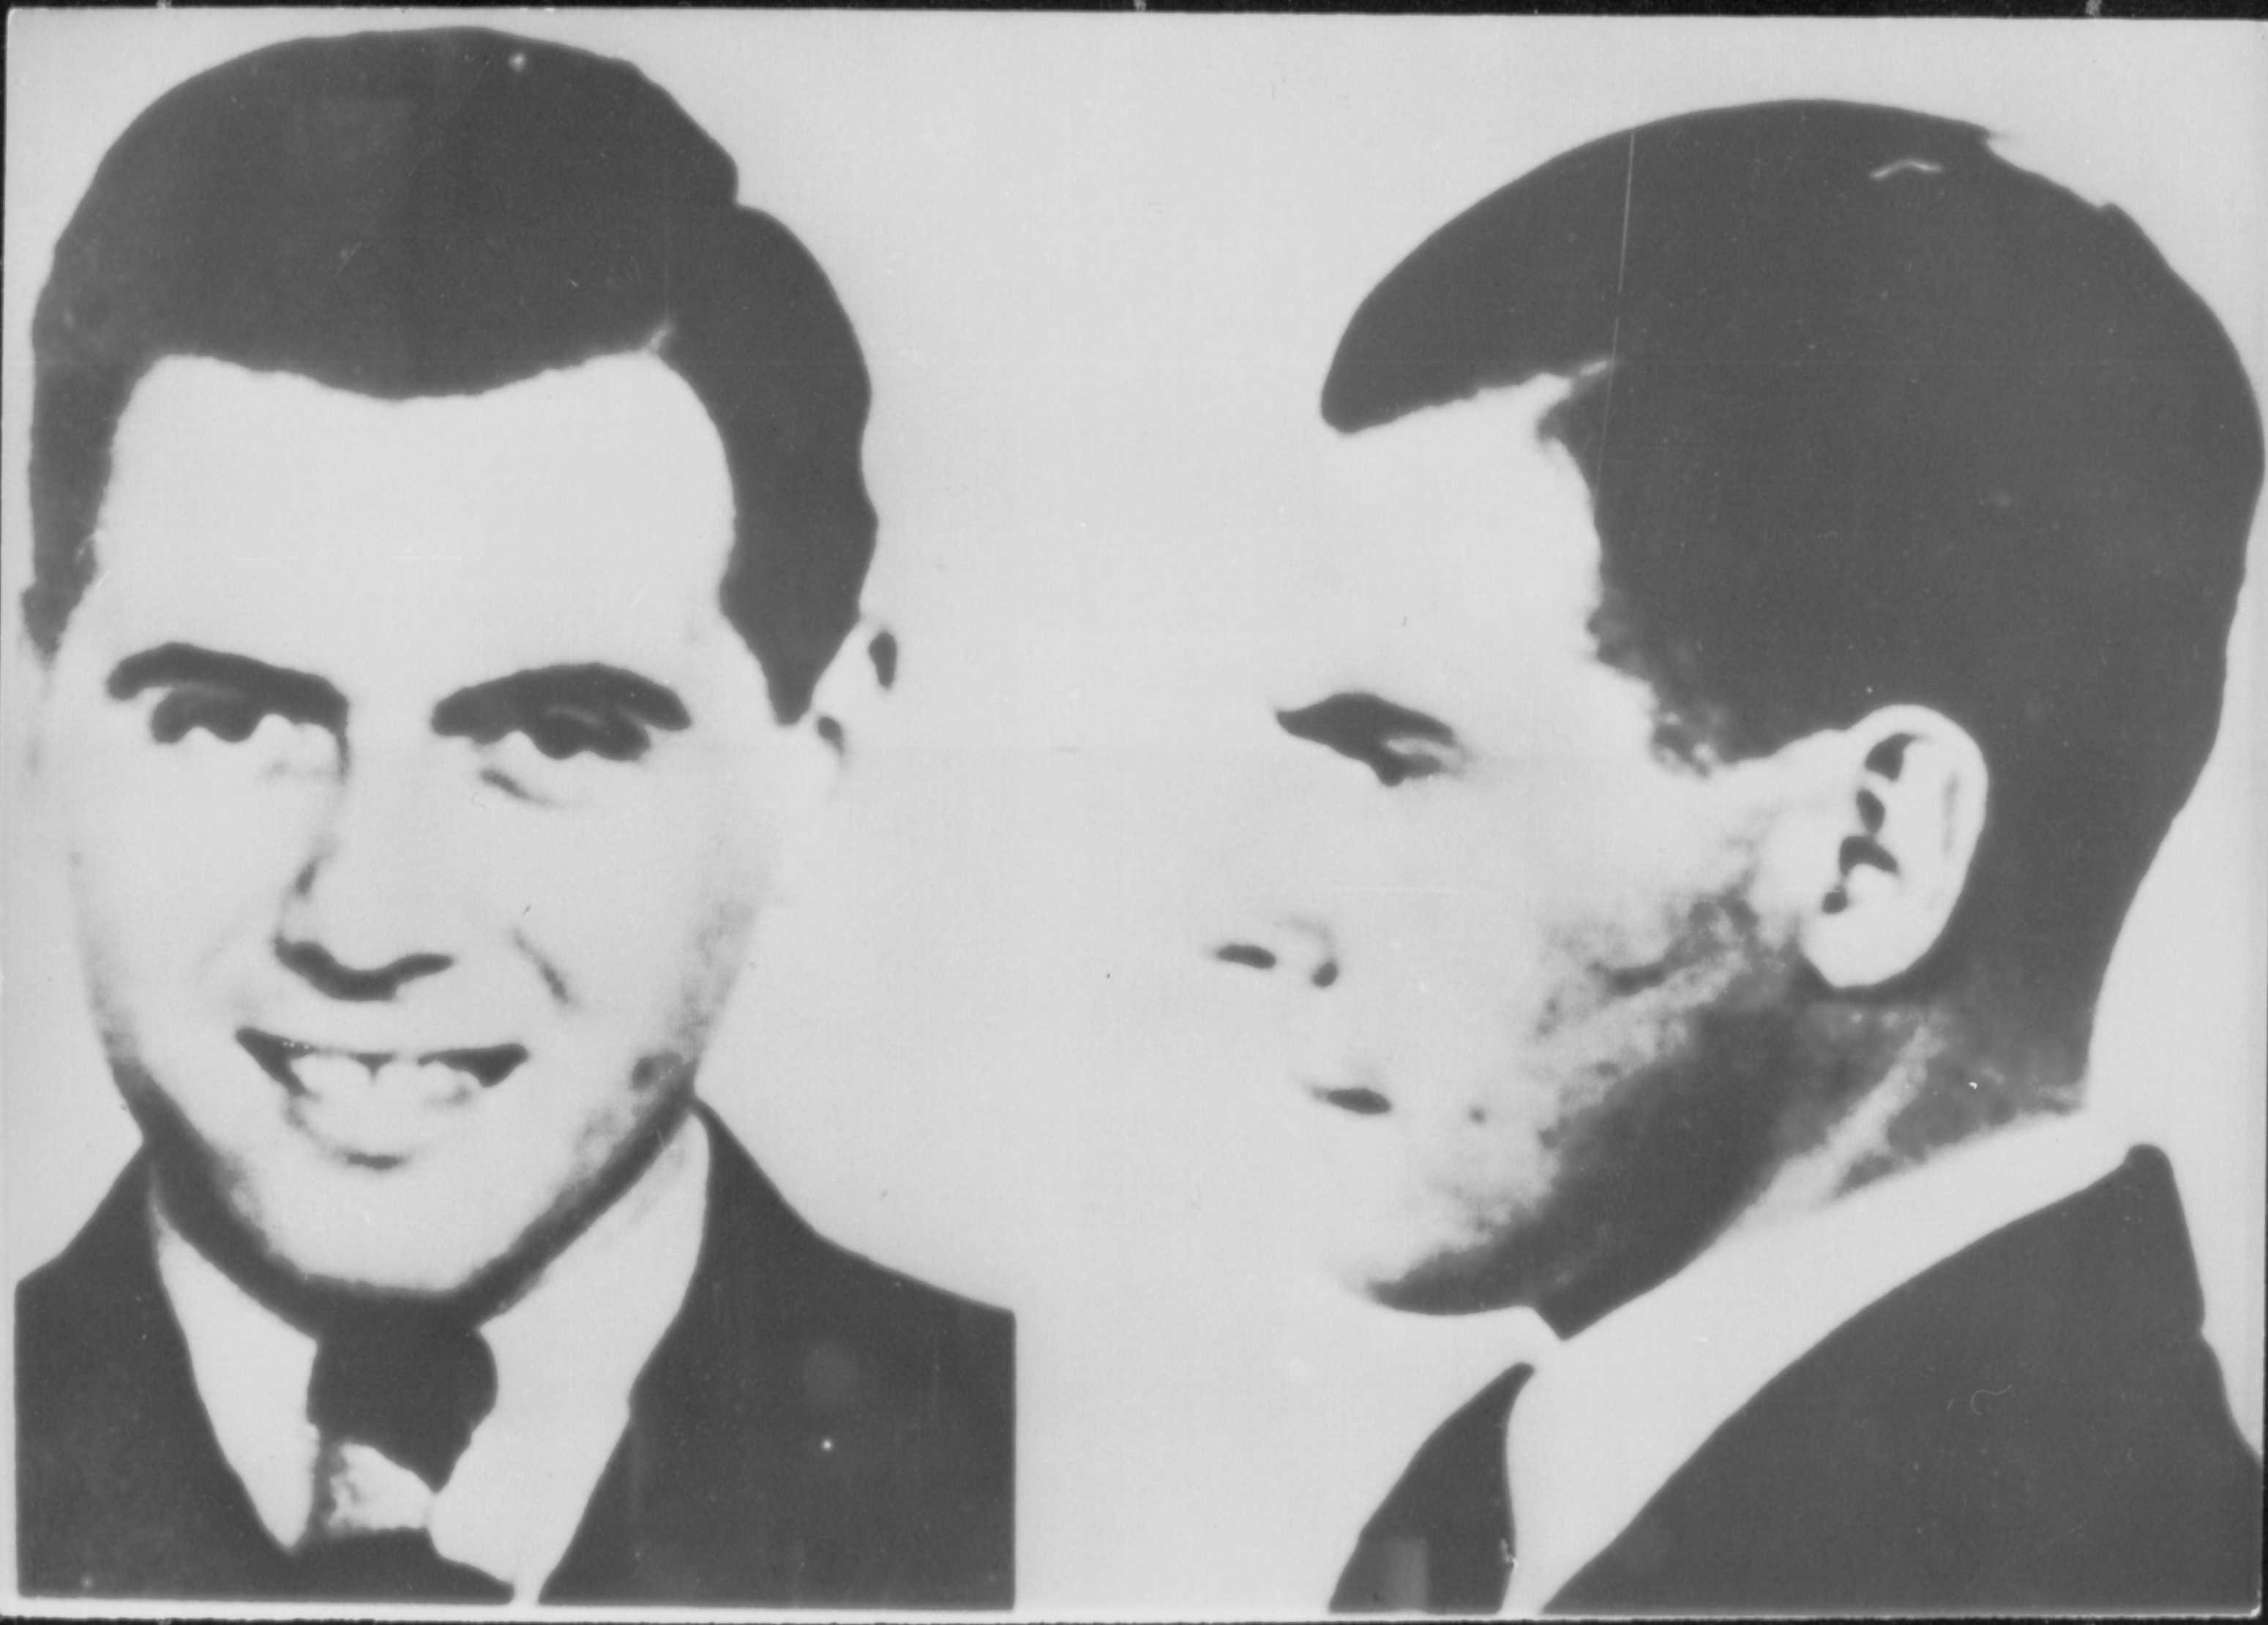 Josef Mengele in 1961